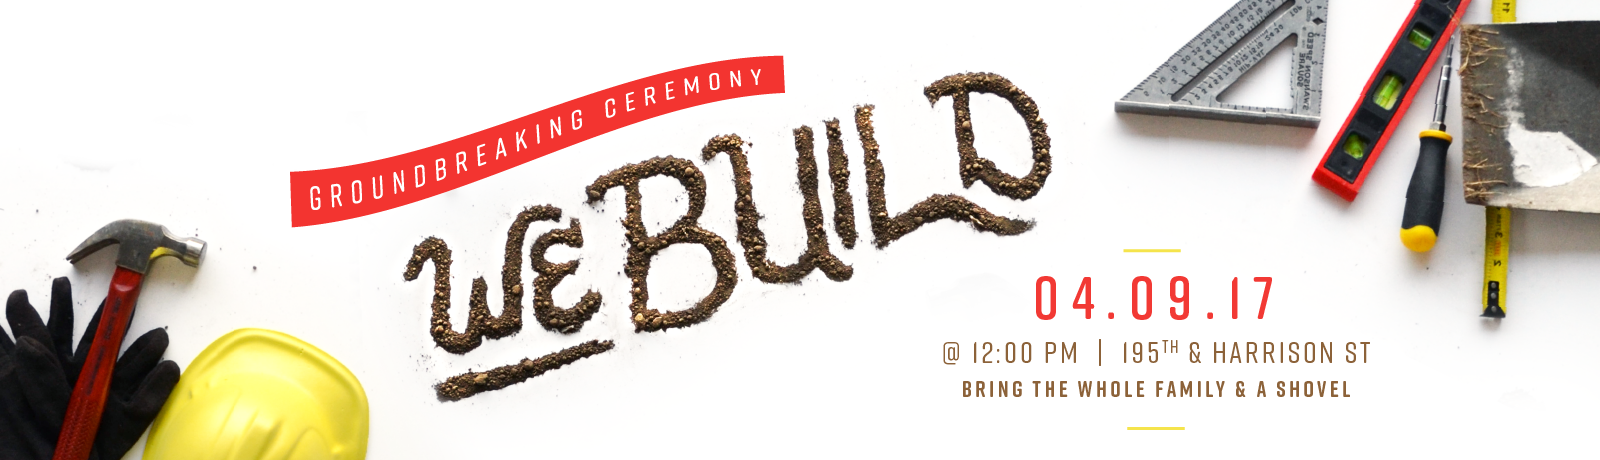 we-build_we-build-web-banner-1600x460